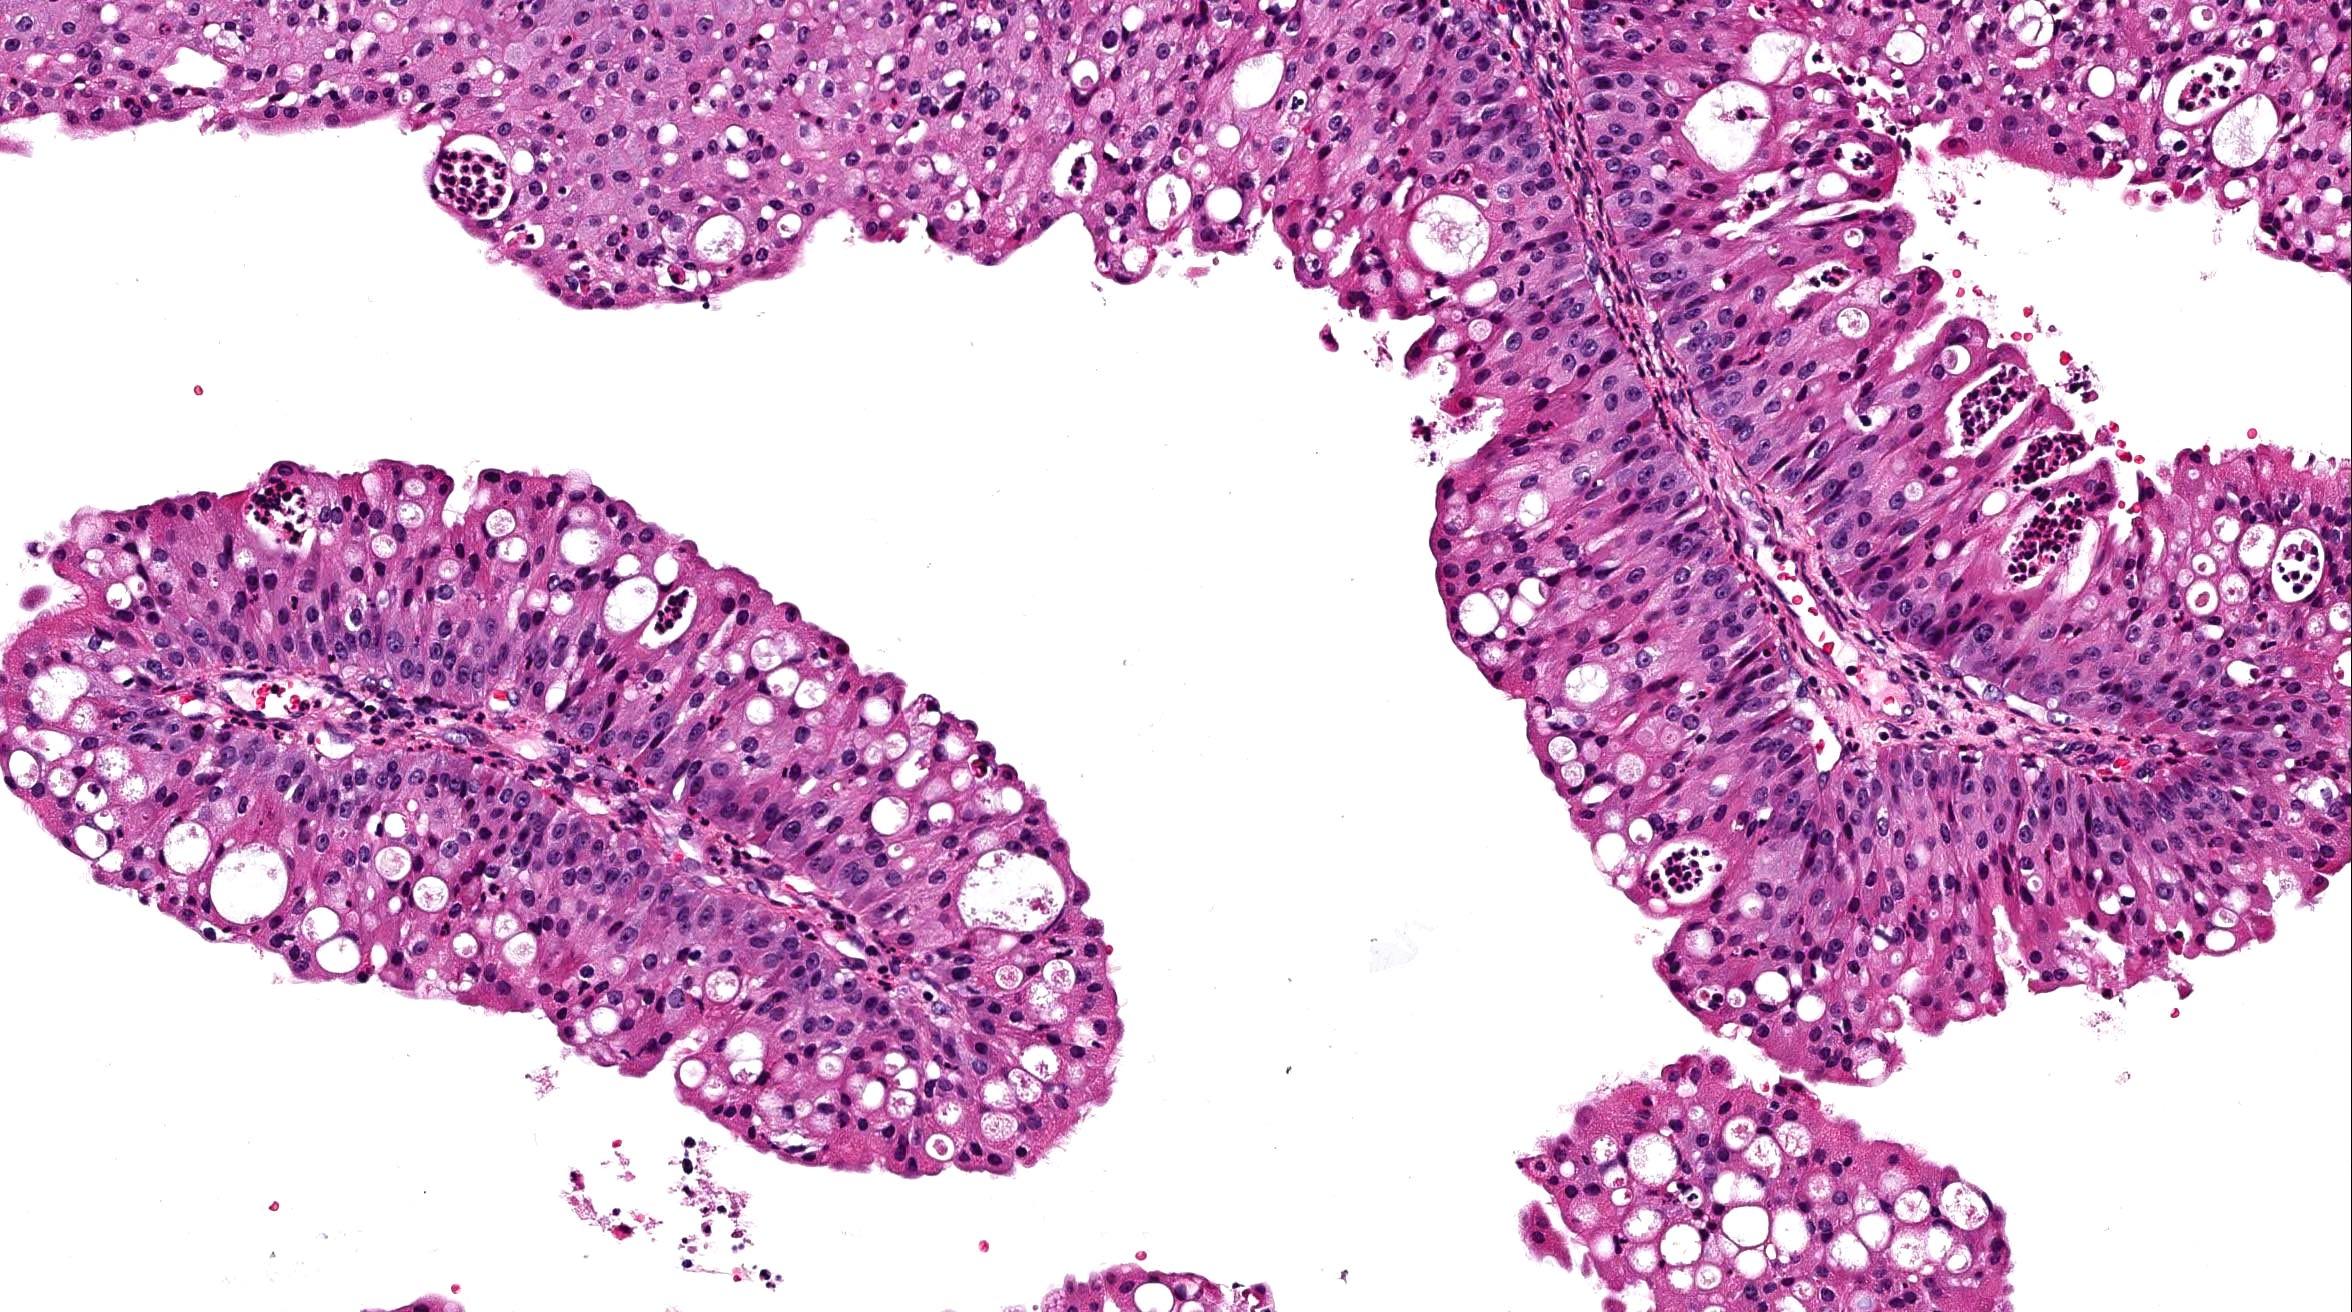 condyloma acuminata symptoms respiratory papillomatosis pathology outlines